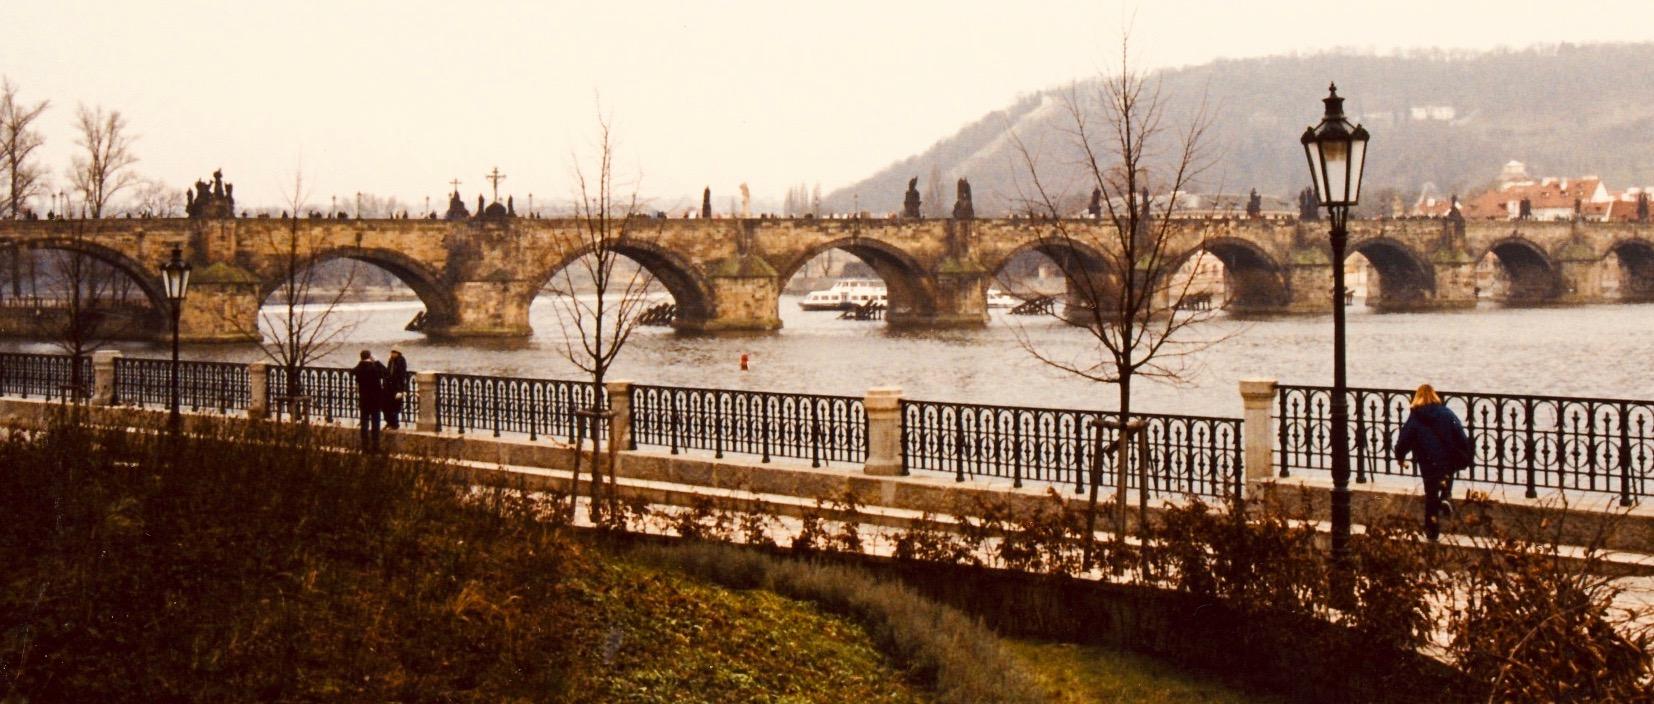 Charles Bridge December 2002.